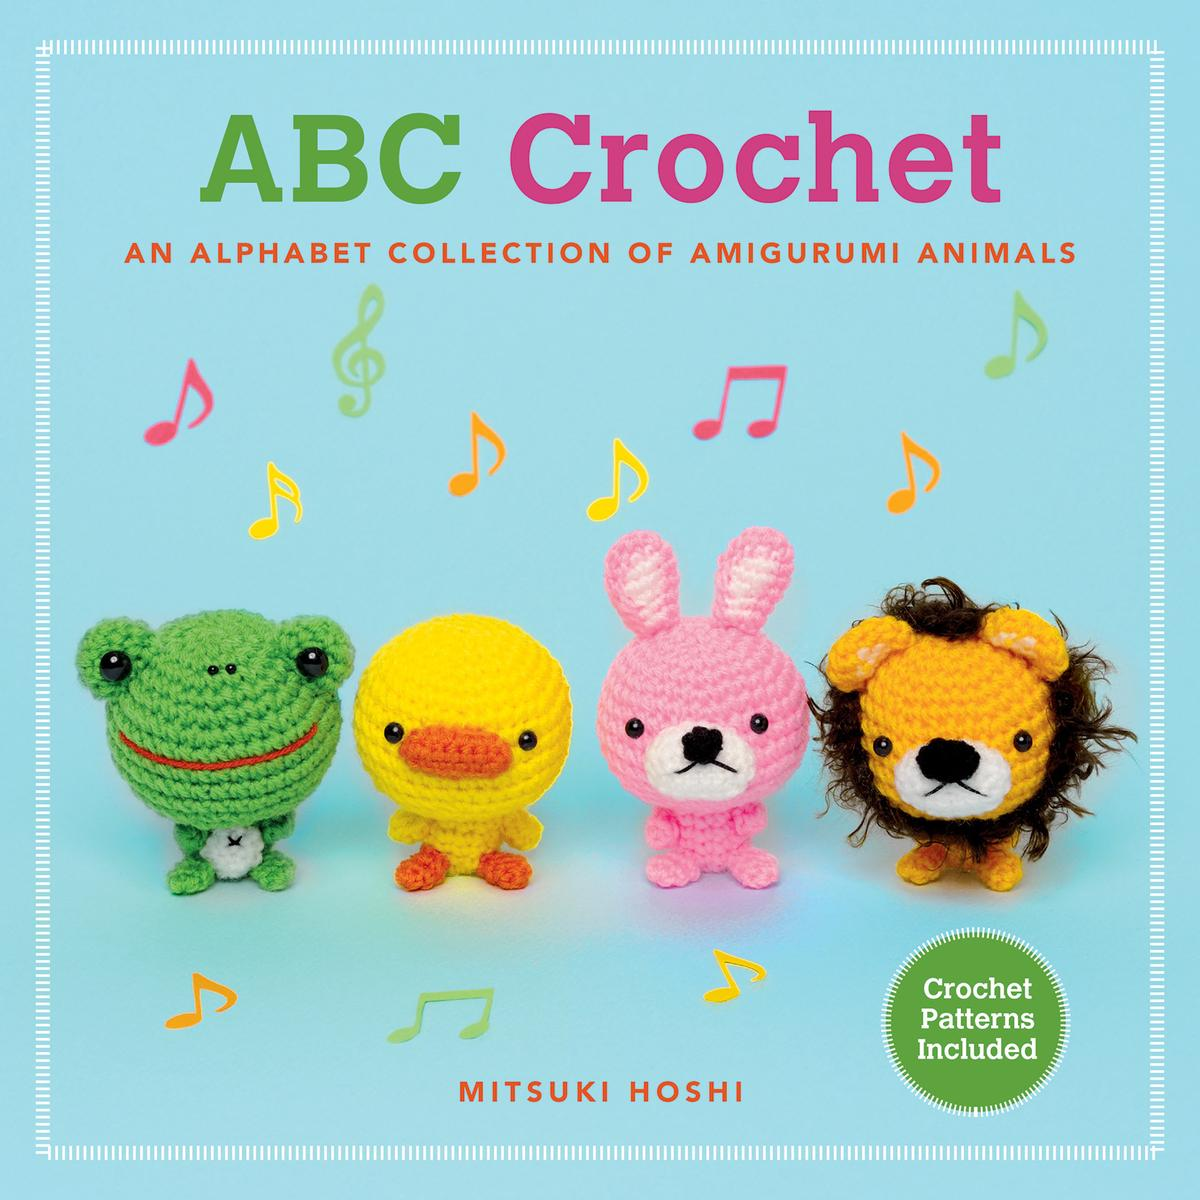 ABC Crochet : An Alphabet Collection of Amigurumi Animals